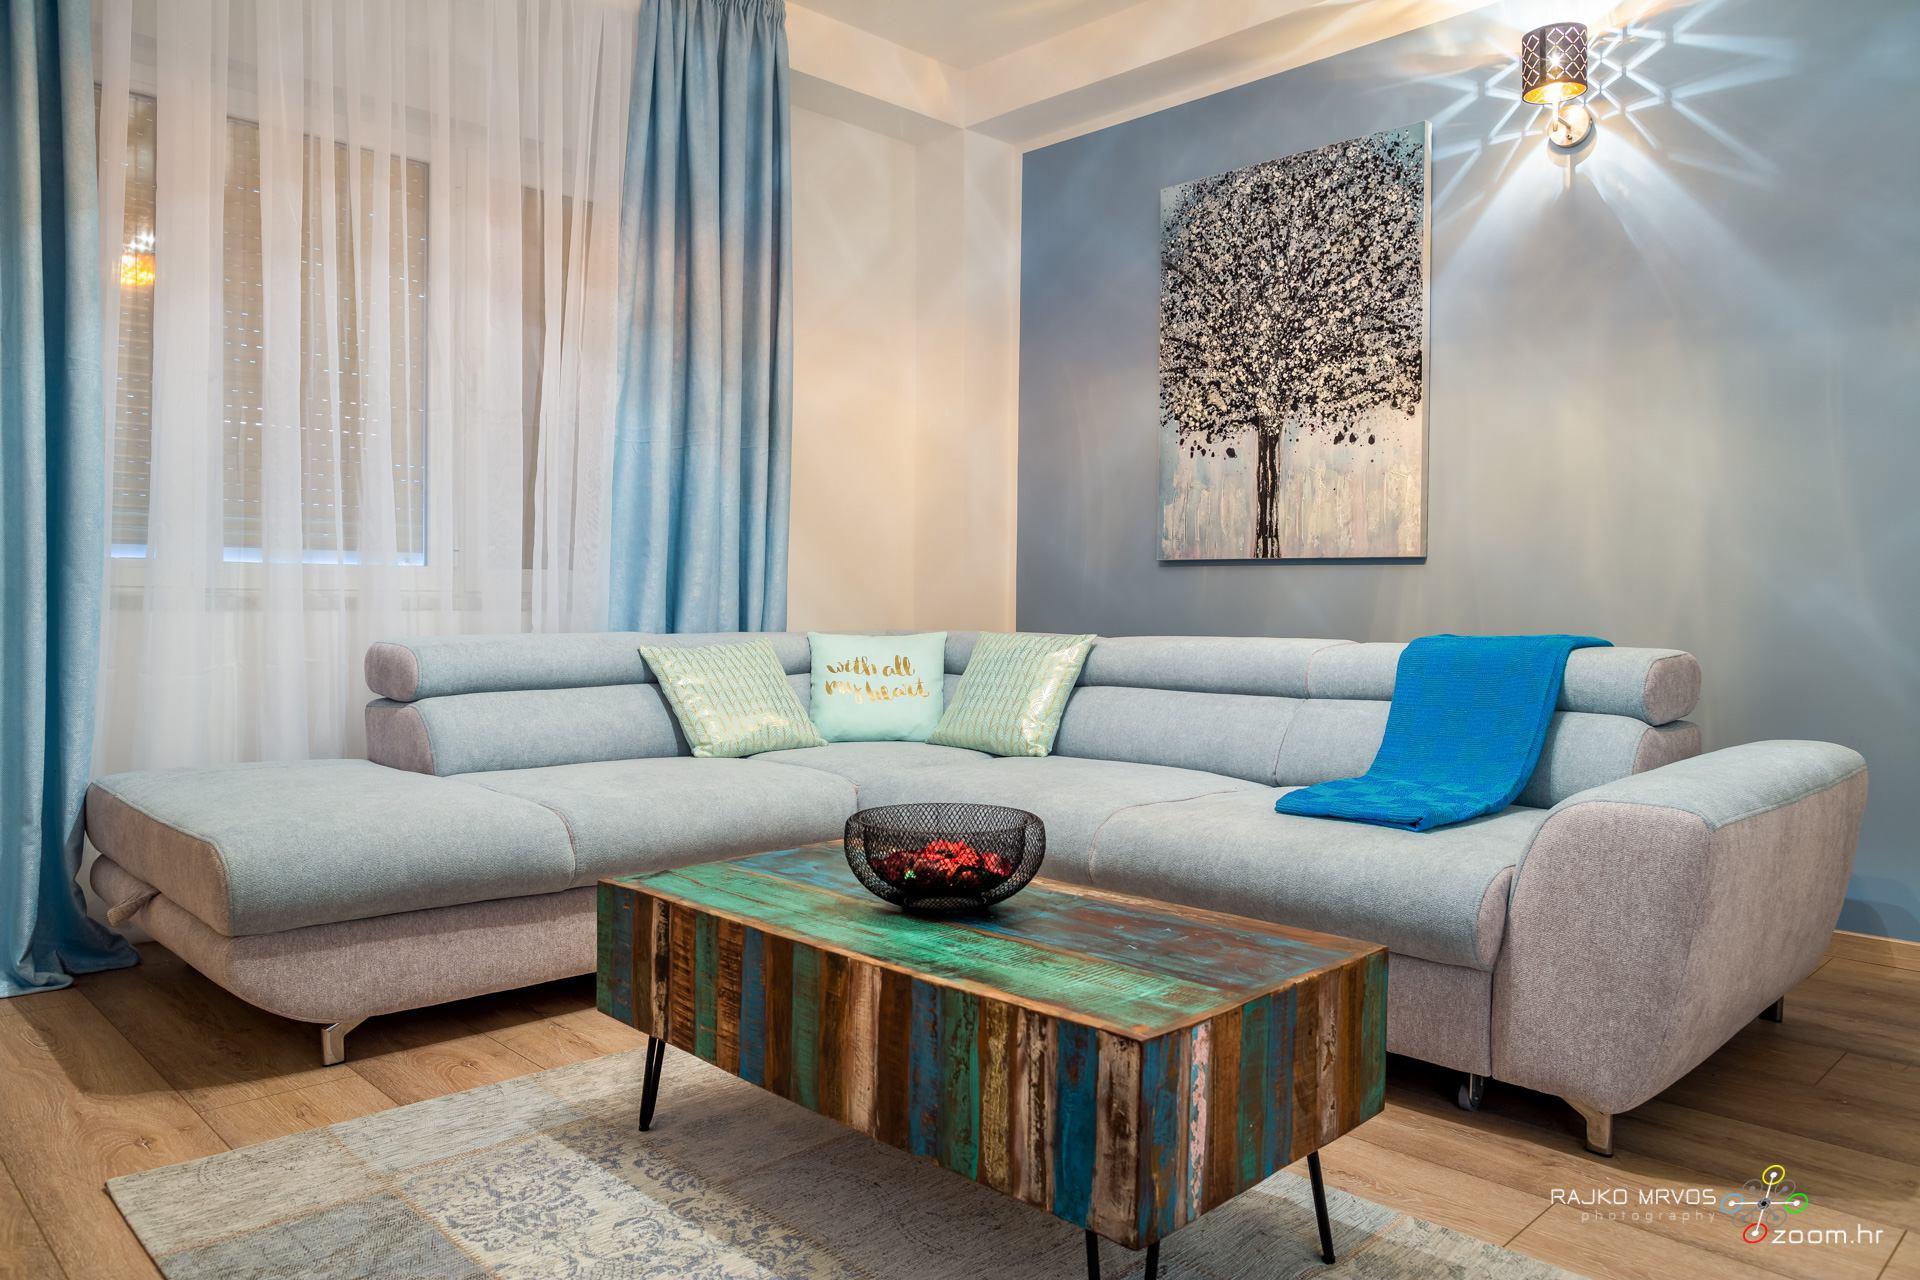 fotografiranje-interijera-fotograf-apartmana-vila-kuca-hotela-apartman-Gabby-Rijeka-19